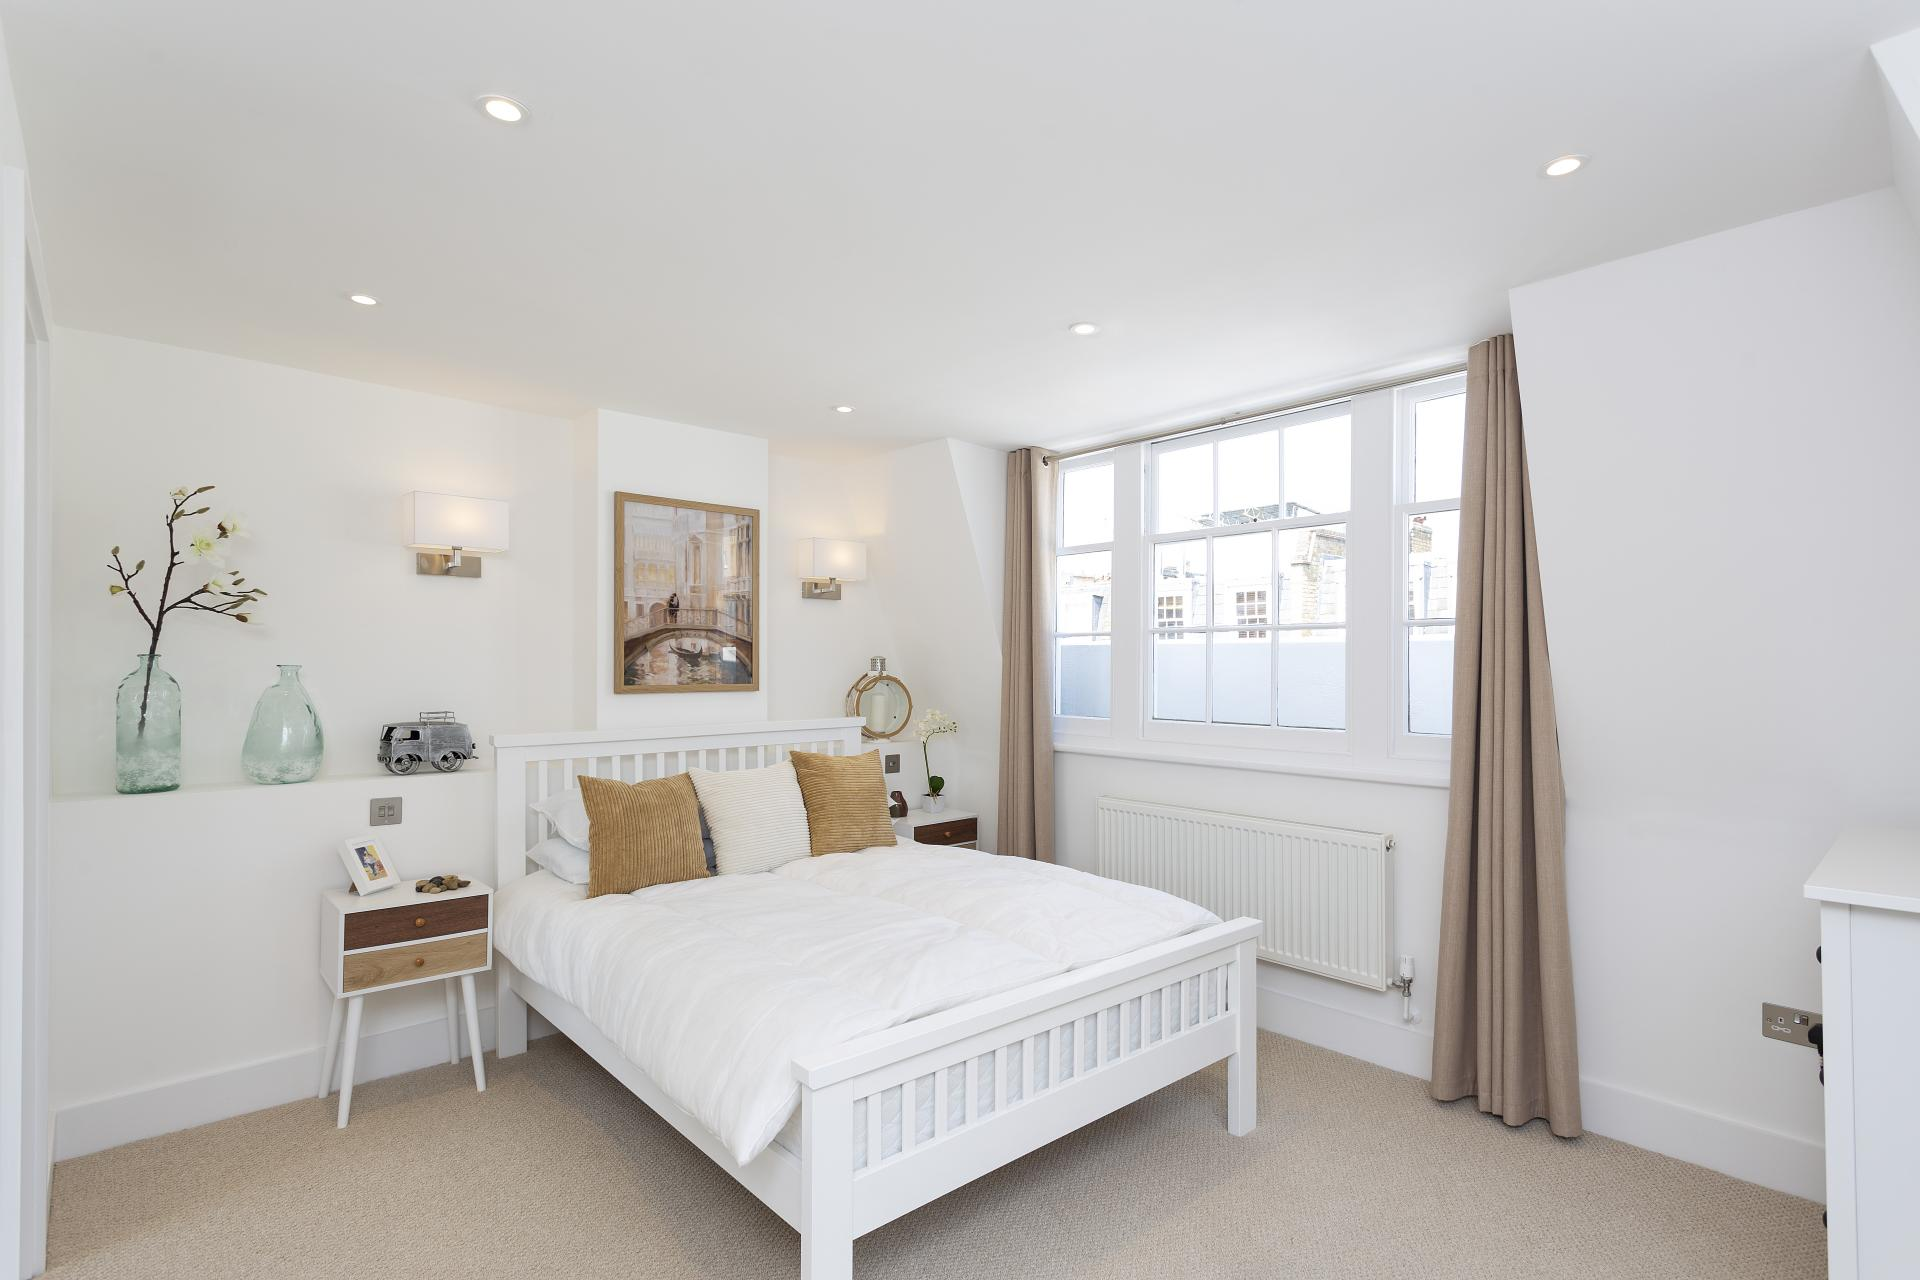 Bed at Luxury Knightsbridge House, Knightsbridge, London - Citybase Apartments